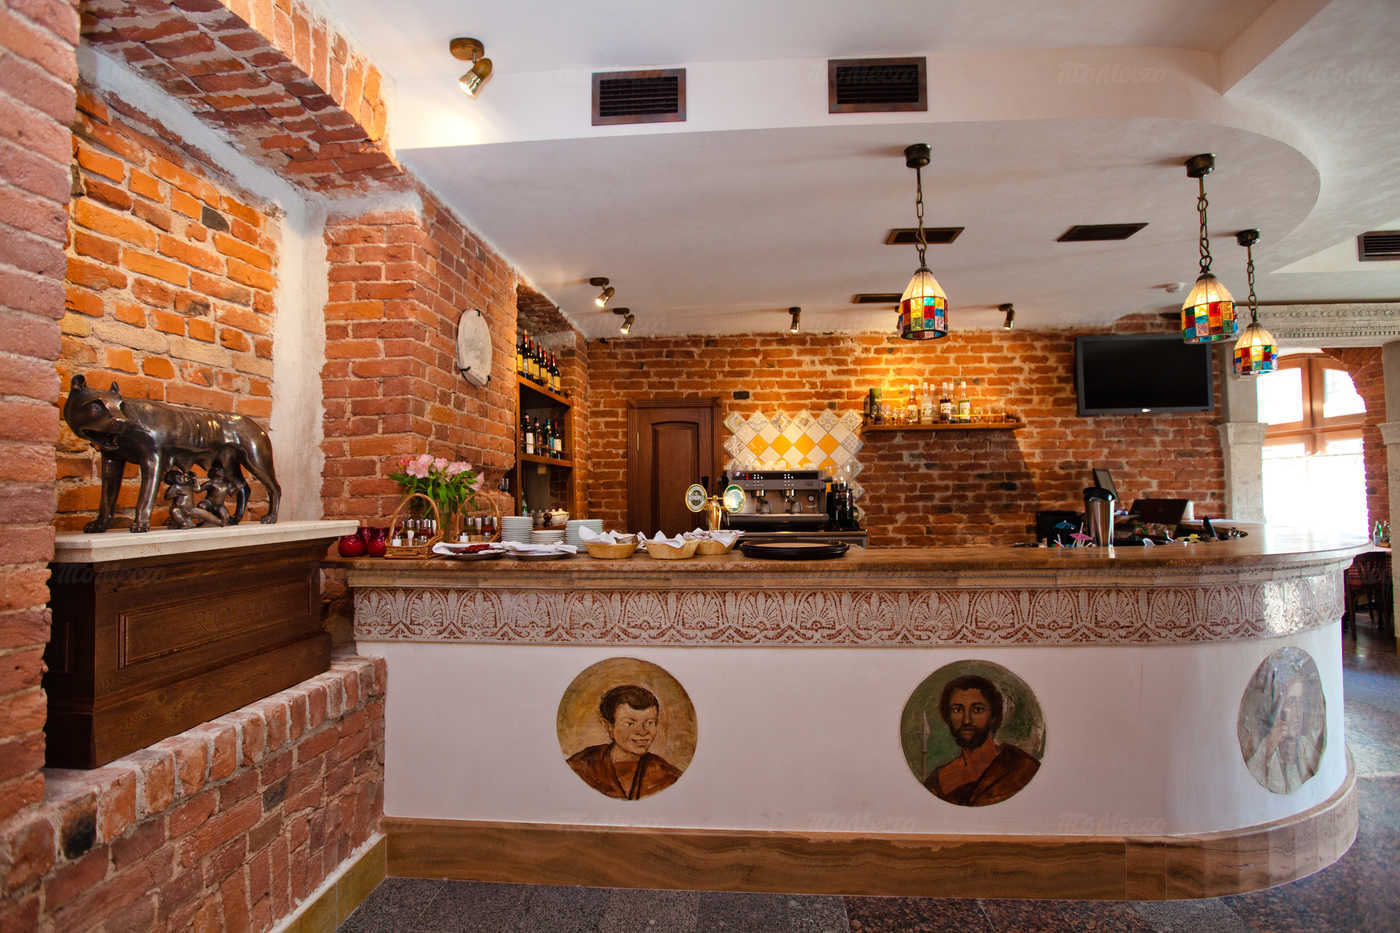 Ресторан Мама Рома (Mama Roma) на Невском проспекте